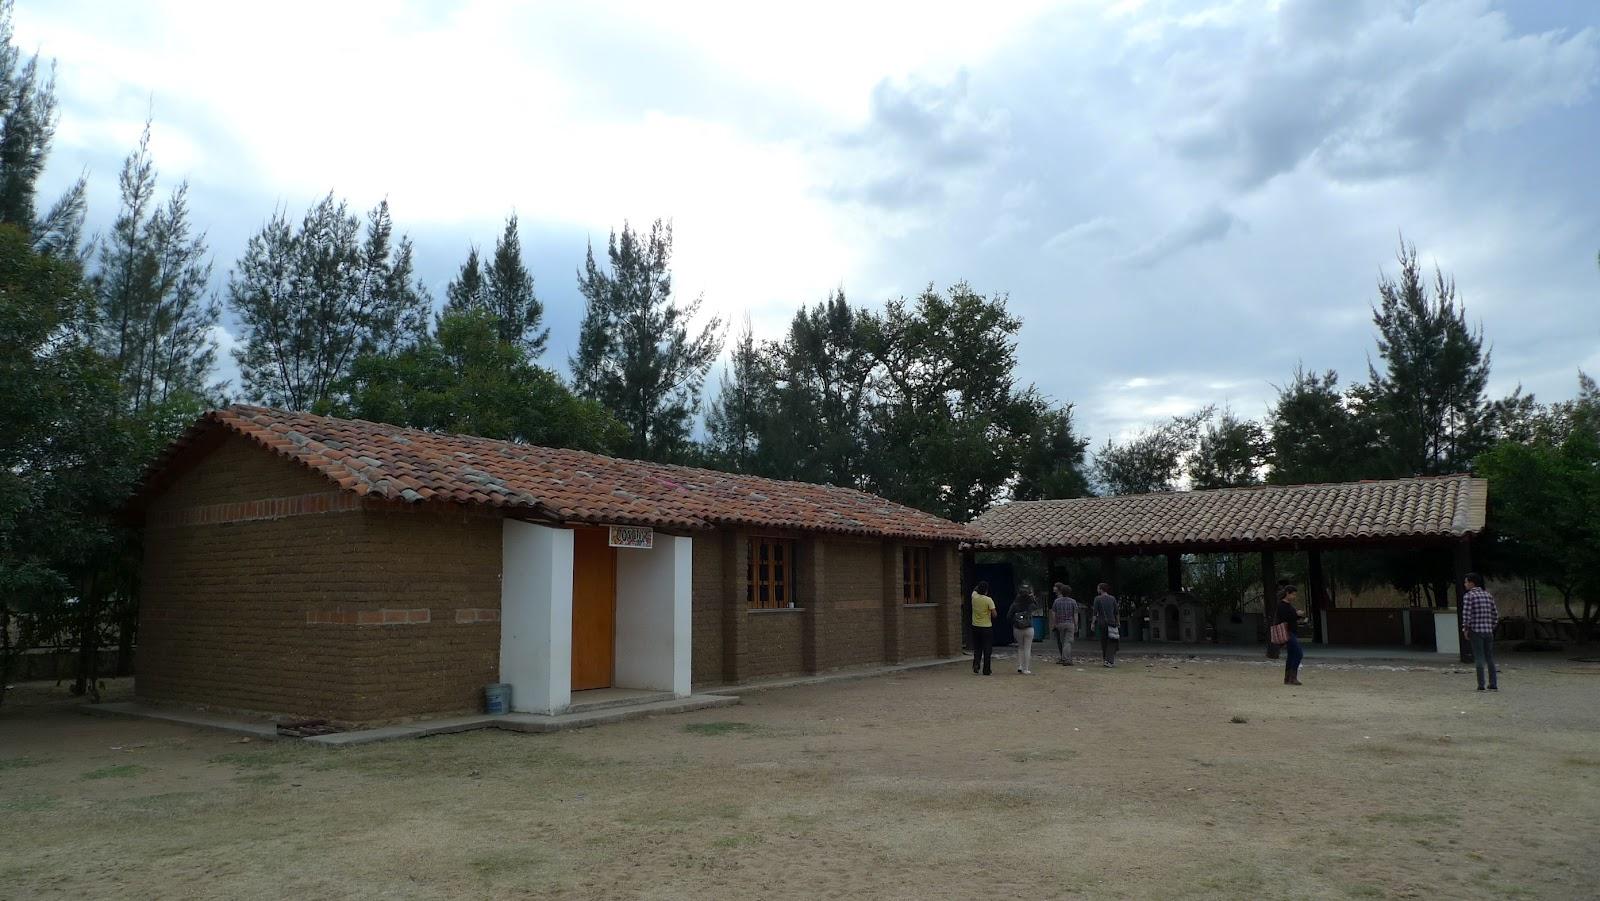 Suficiente Arquitectura Viaje A Oaxaca